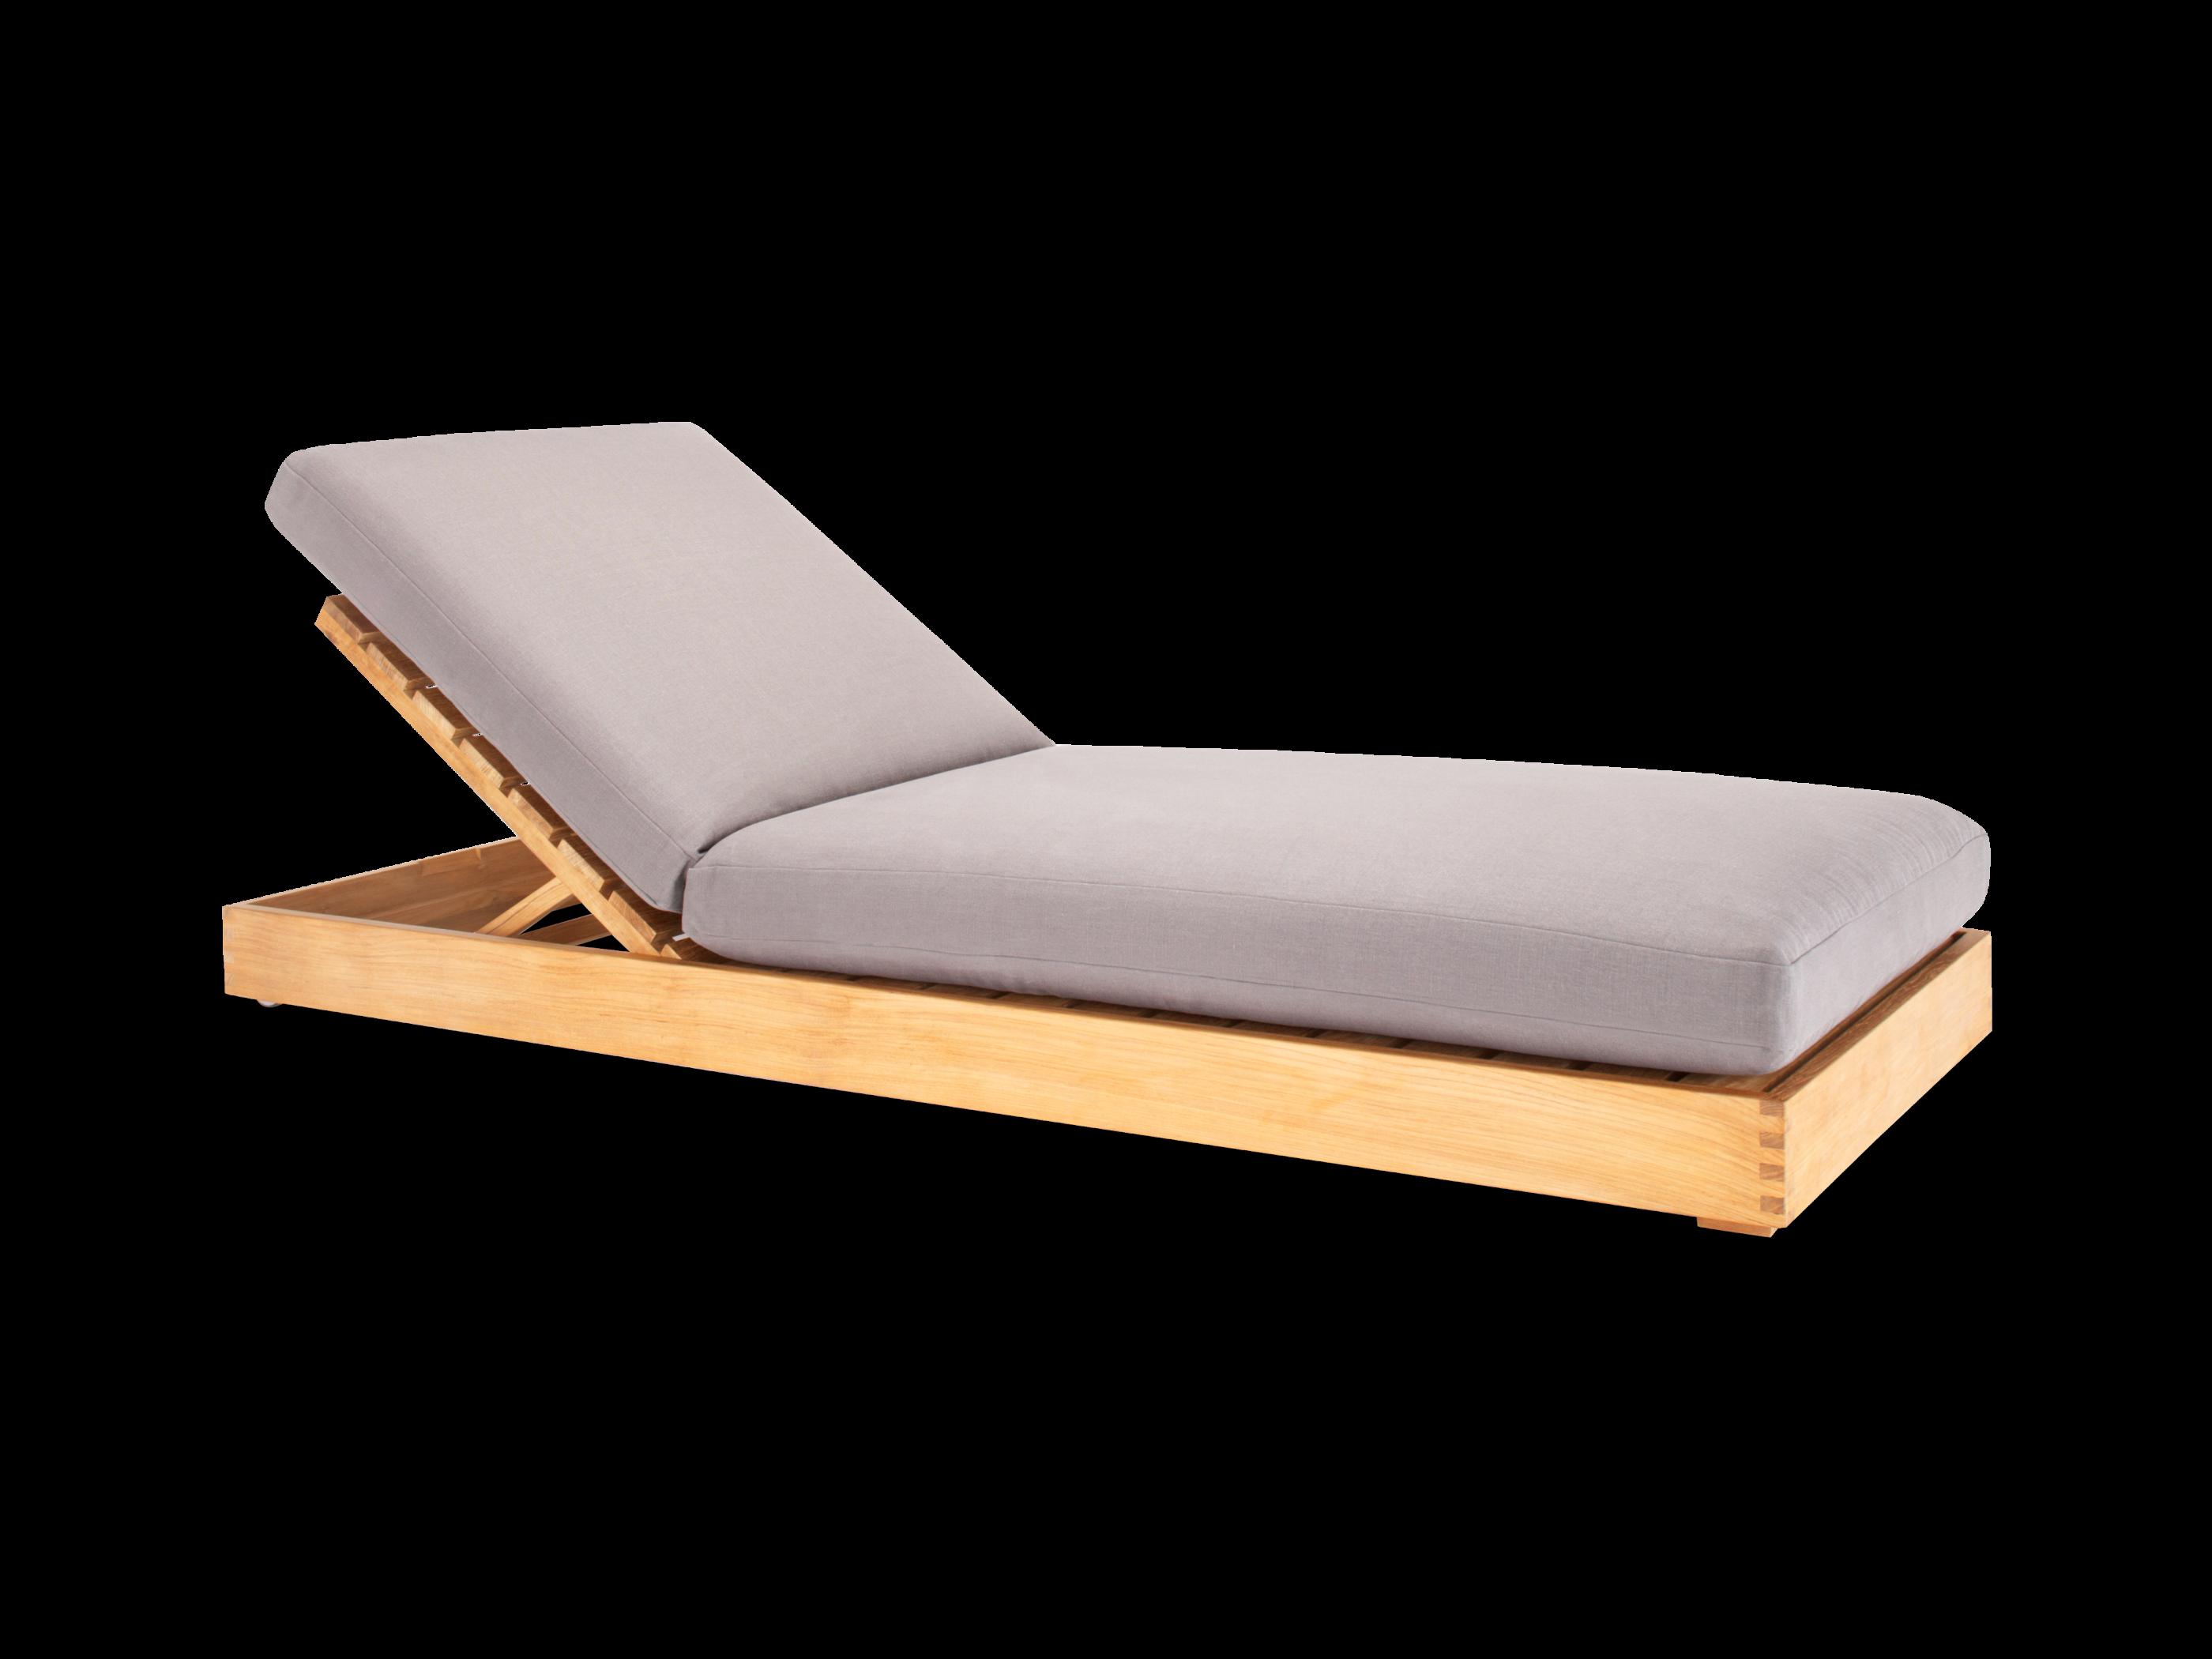 Burleigh Outdoor Daybeds Modern Designer Furniture By Outdoor